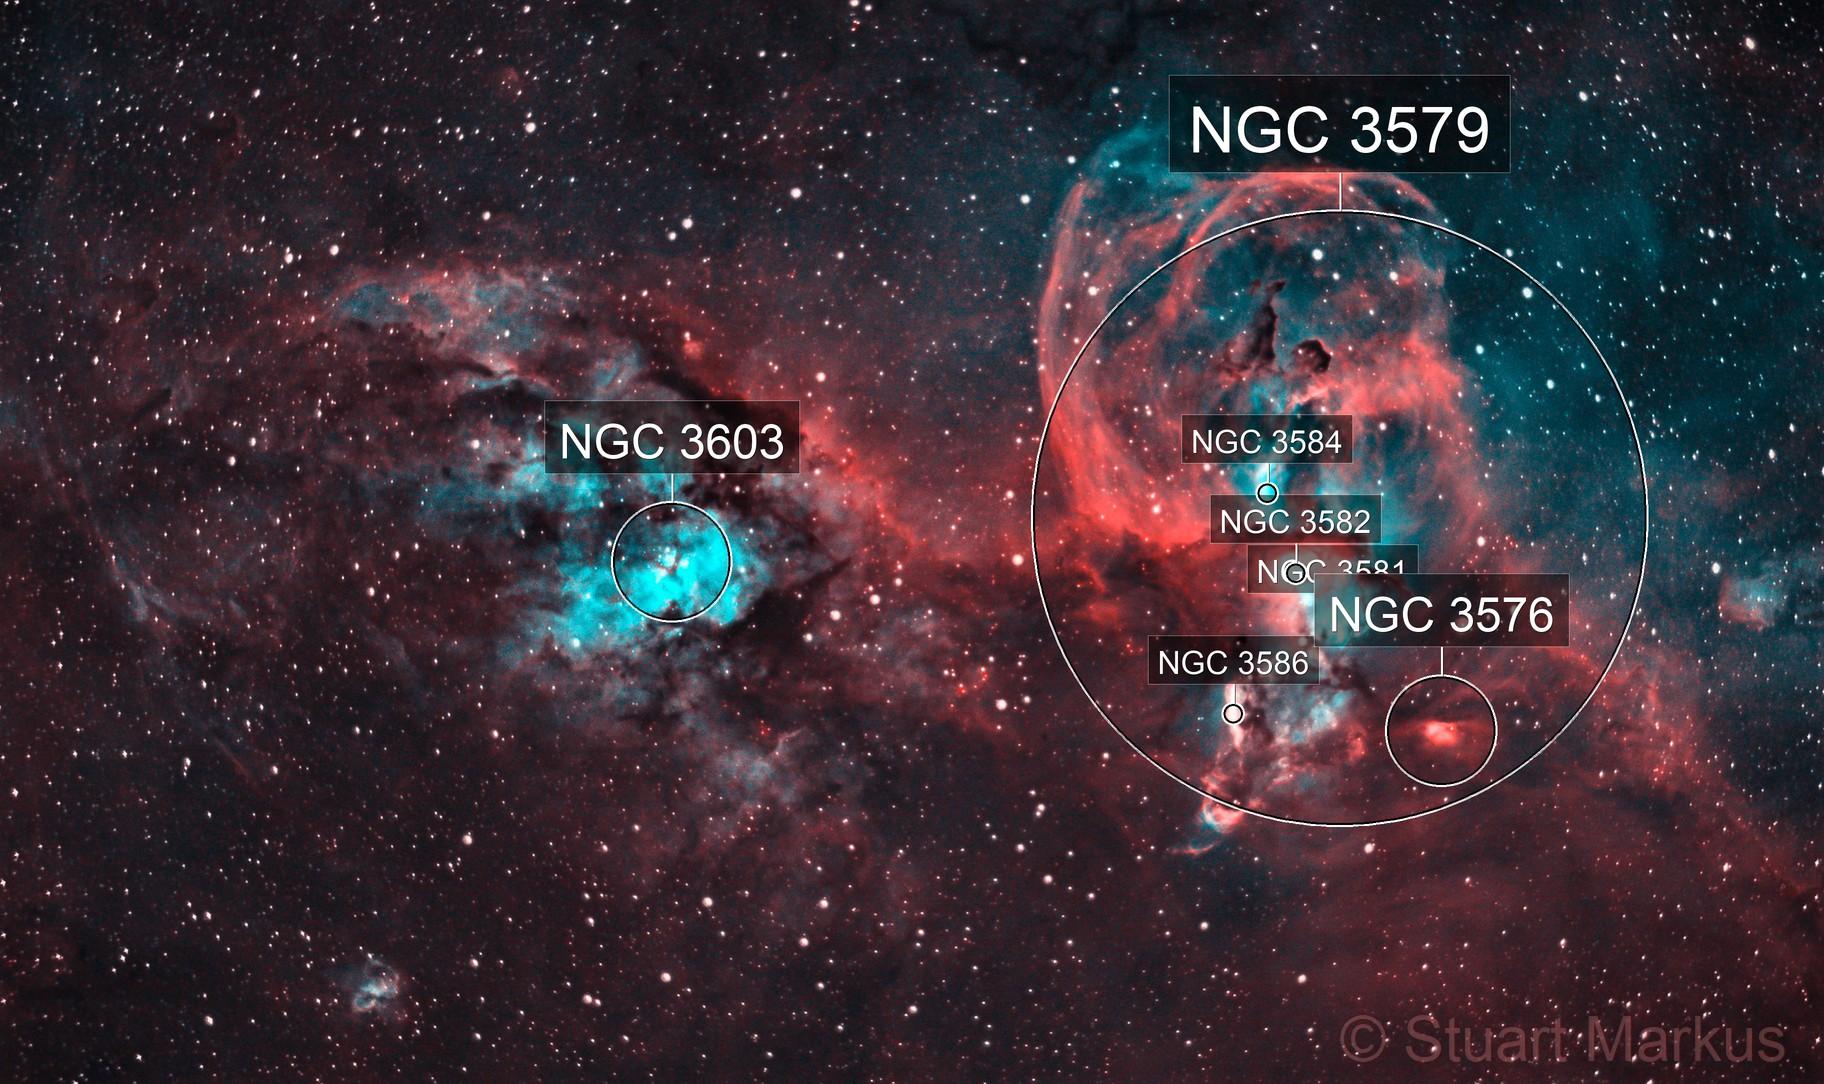 NGC3576 - Princess Leia / Statue of Liberty Nebula